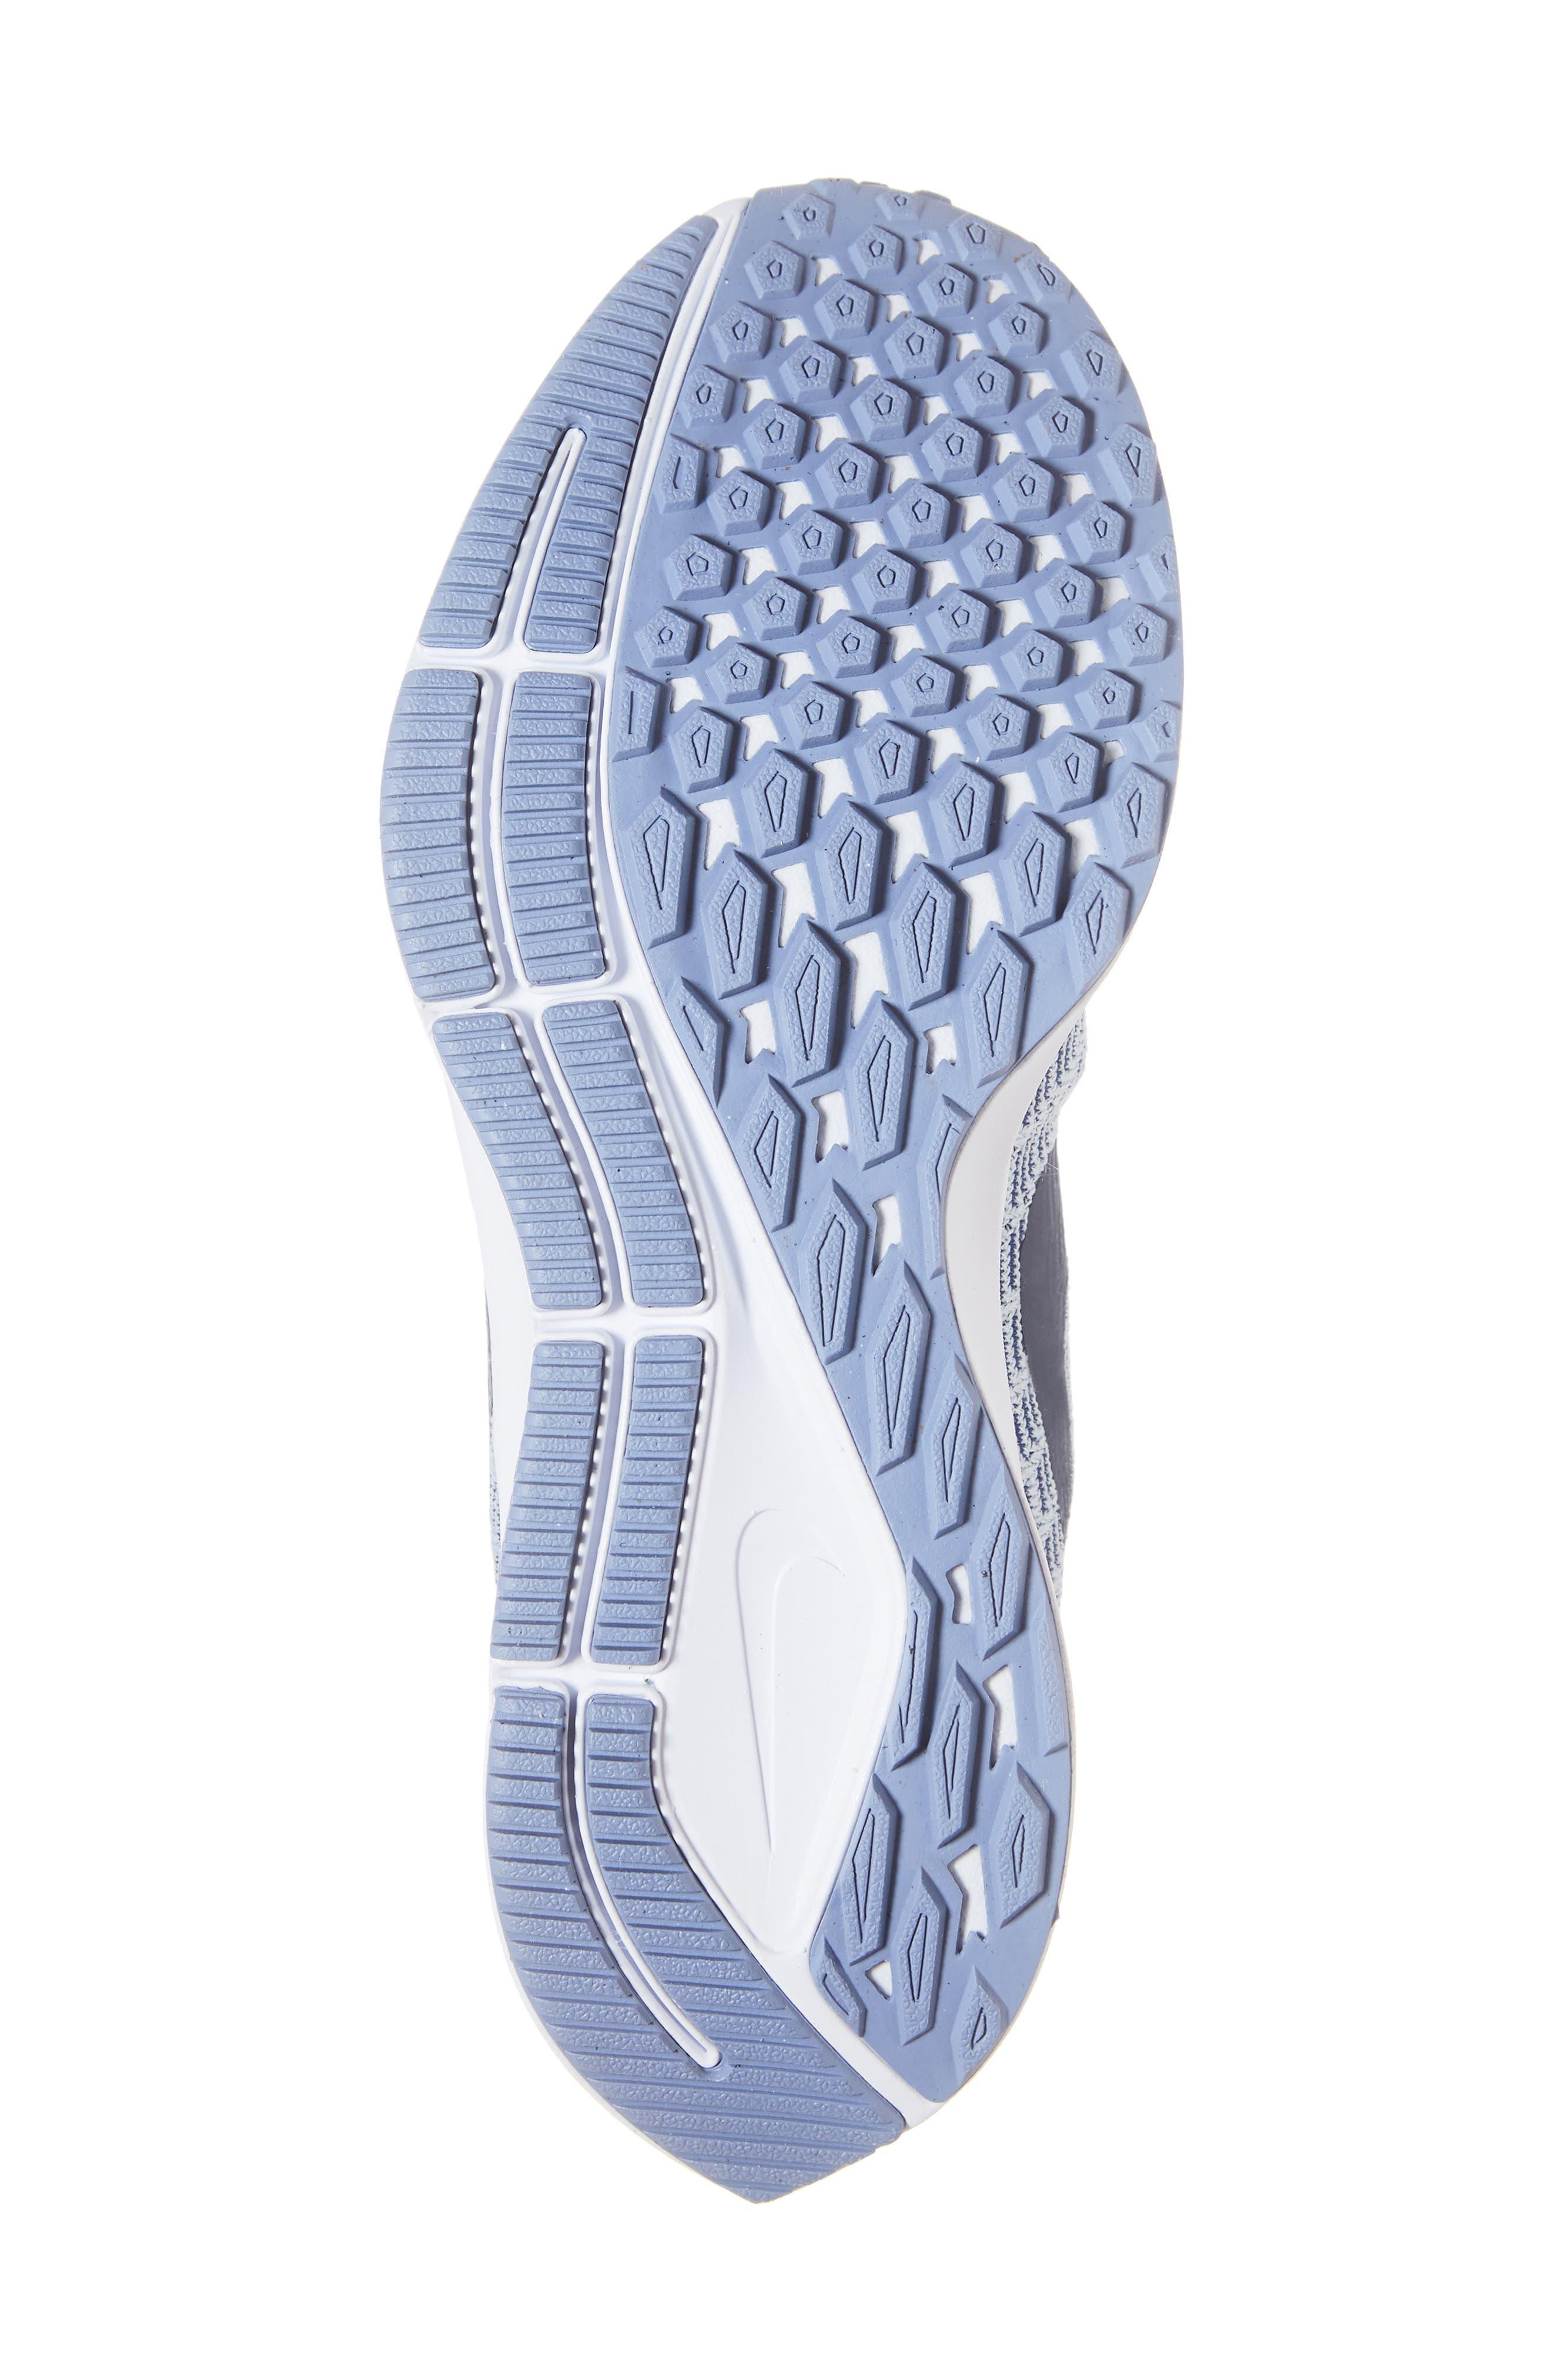 Air Zoom Pegasus 35 Running Shoe,                             Alternate thumbnail 6, color,                             GREY/ BLUE/ WHITE/ ALUMINUM